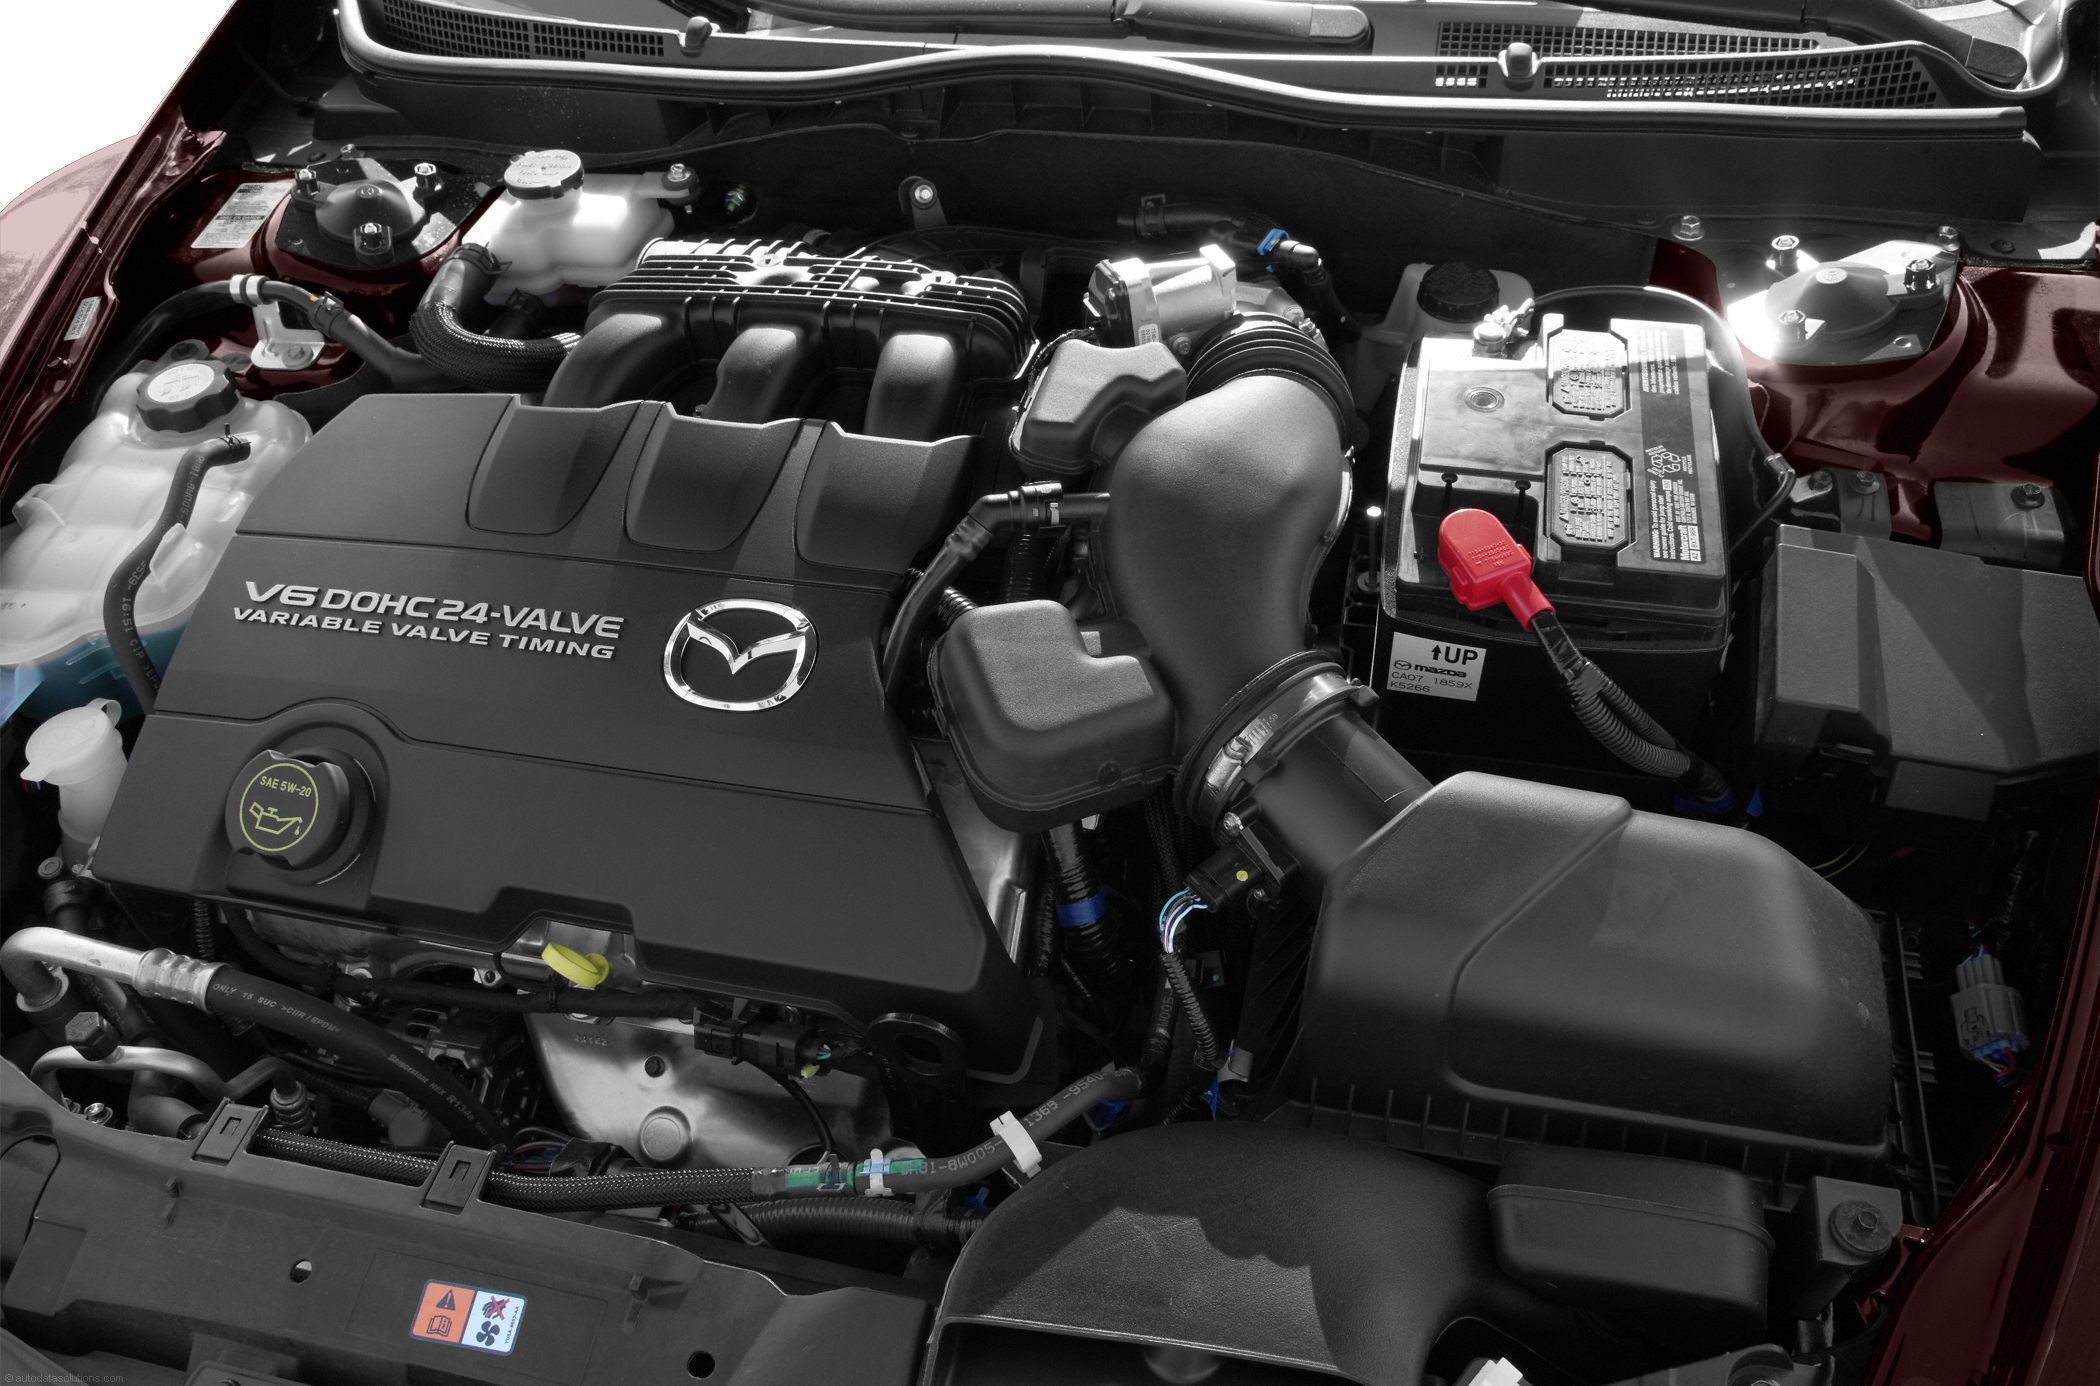 Pin by Used Engines on Mazda Used Engines | Mazda, Mazda 6 ...